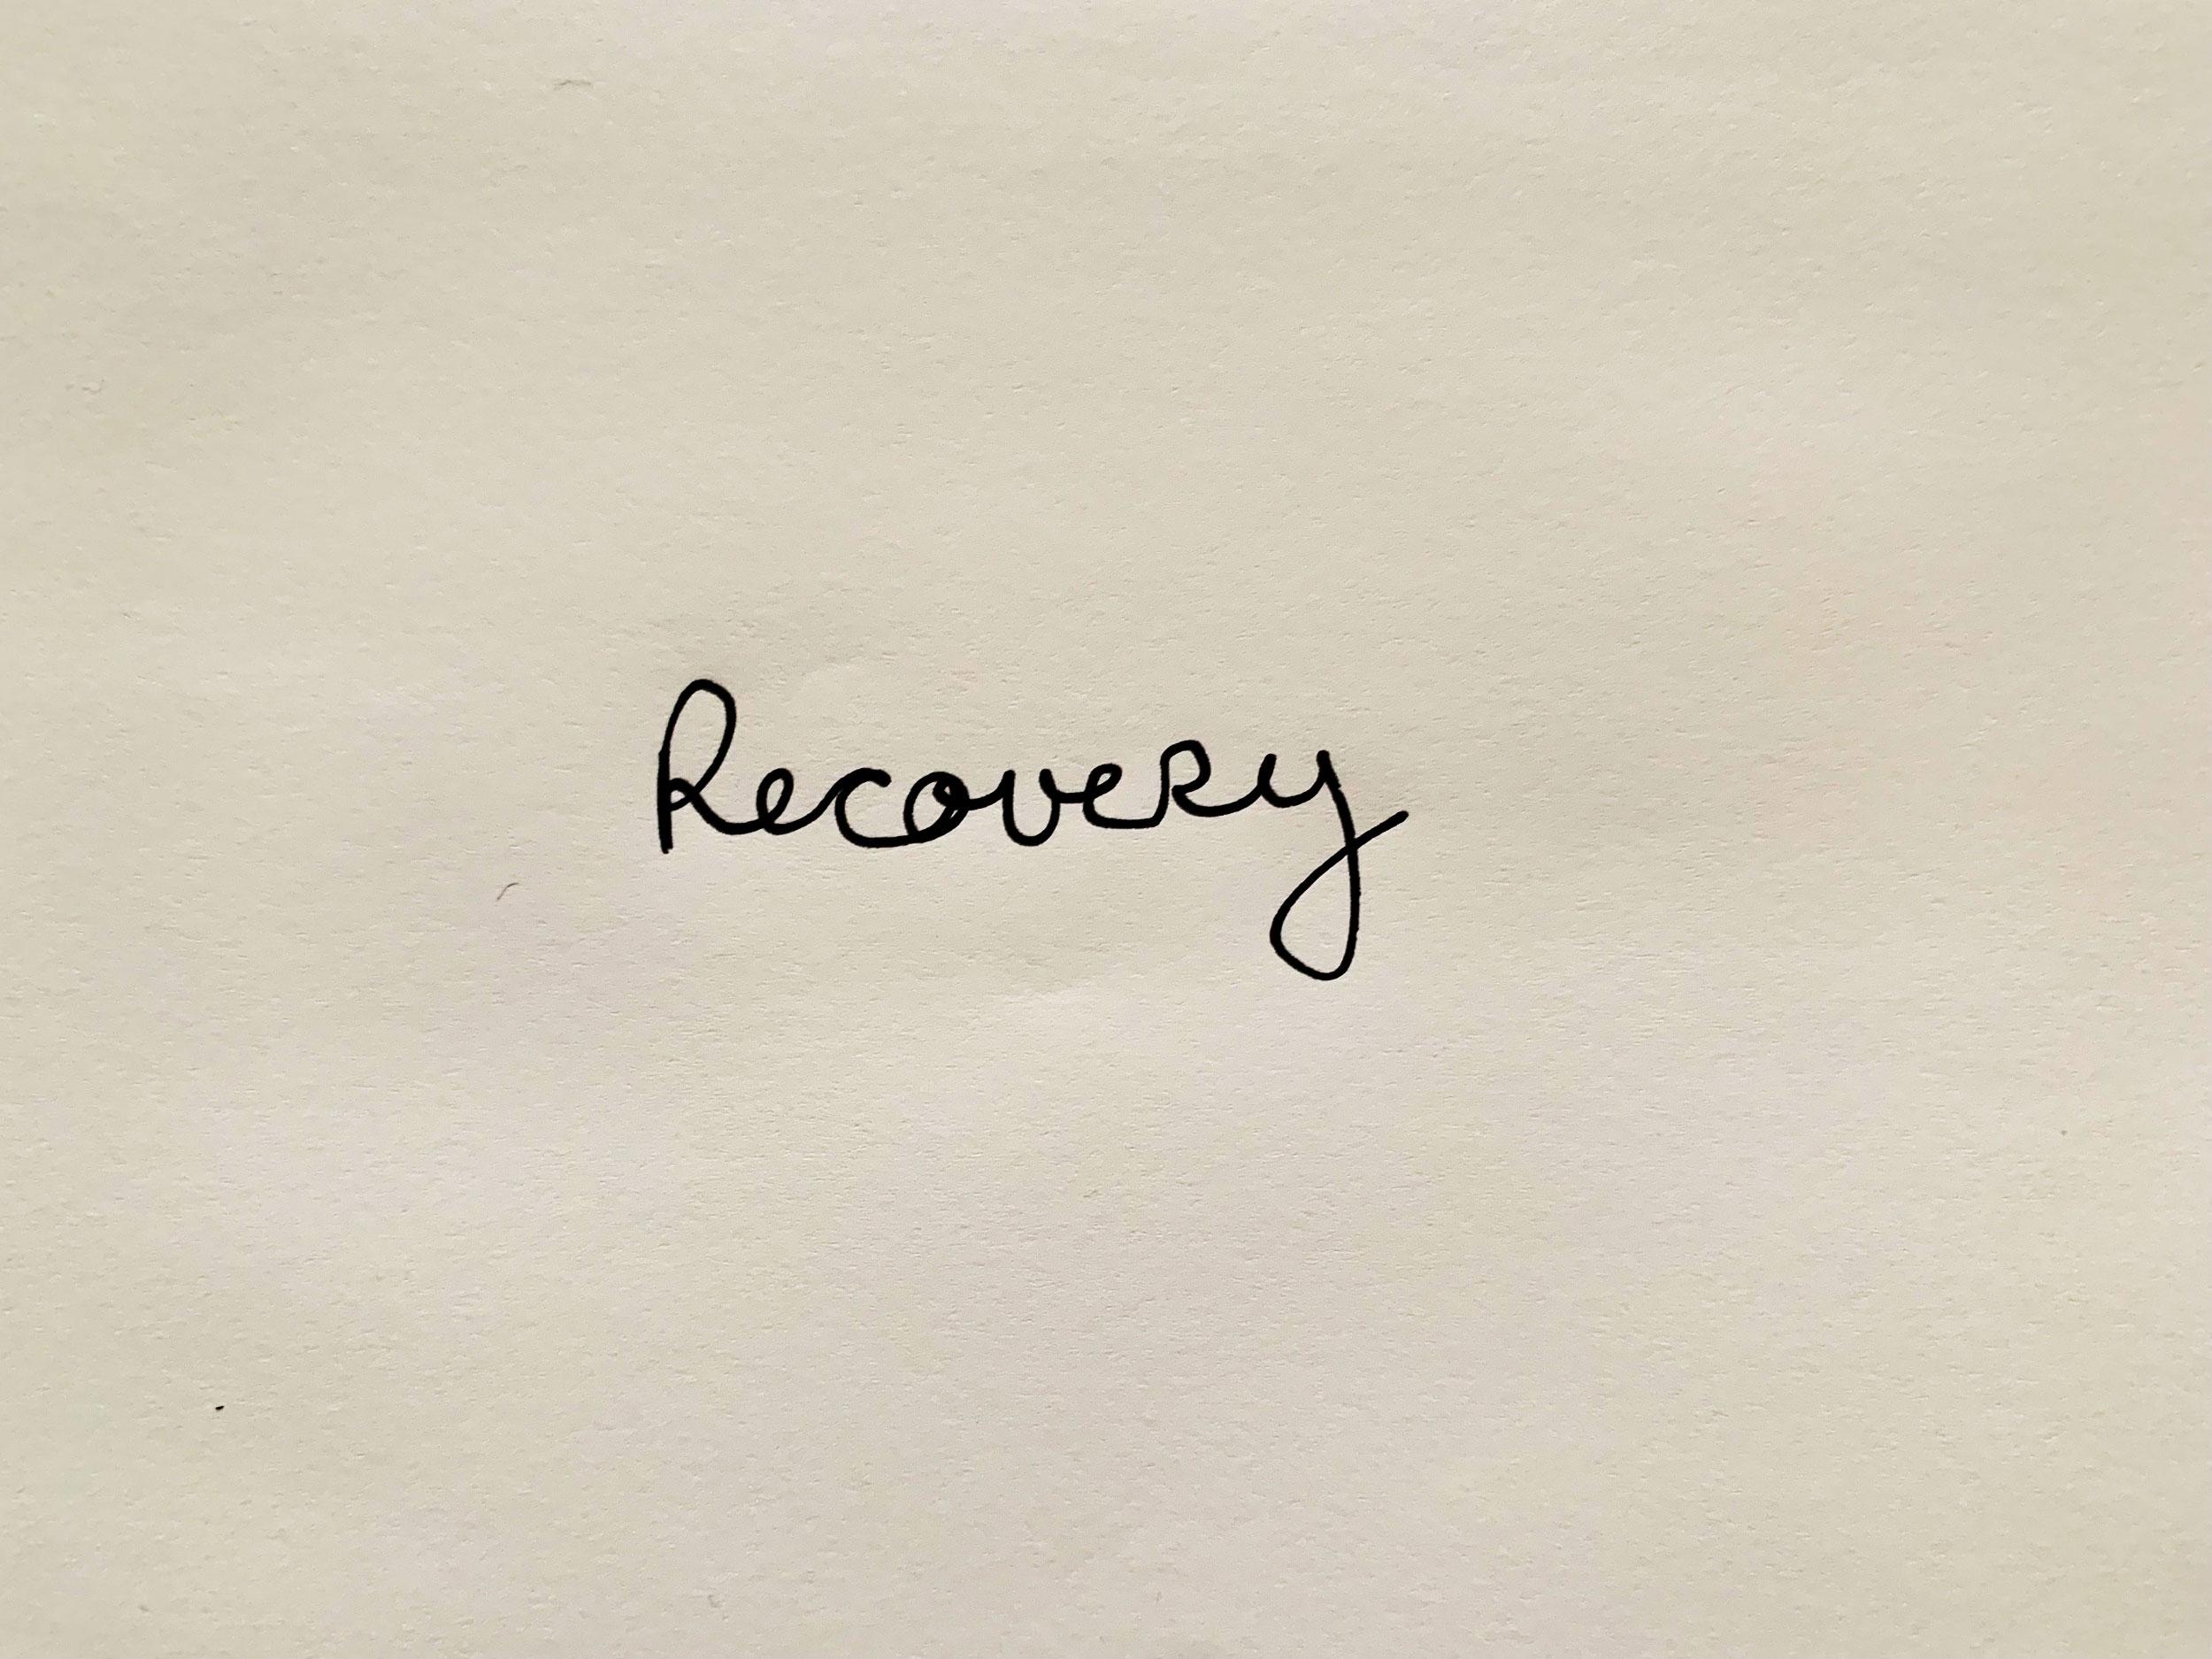 Recovery. Drawing Luke Hockley.